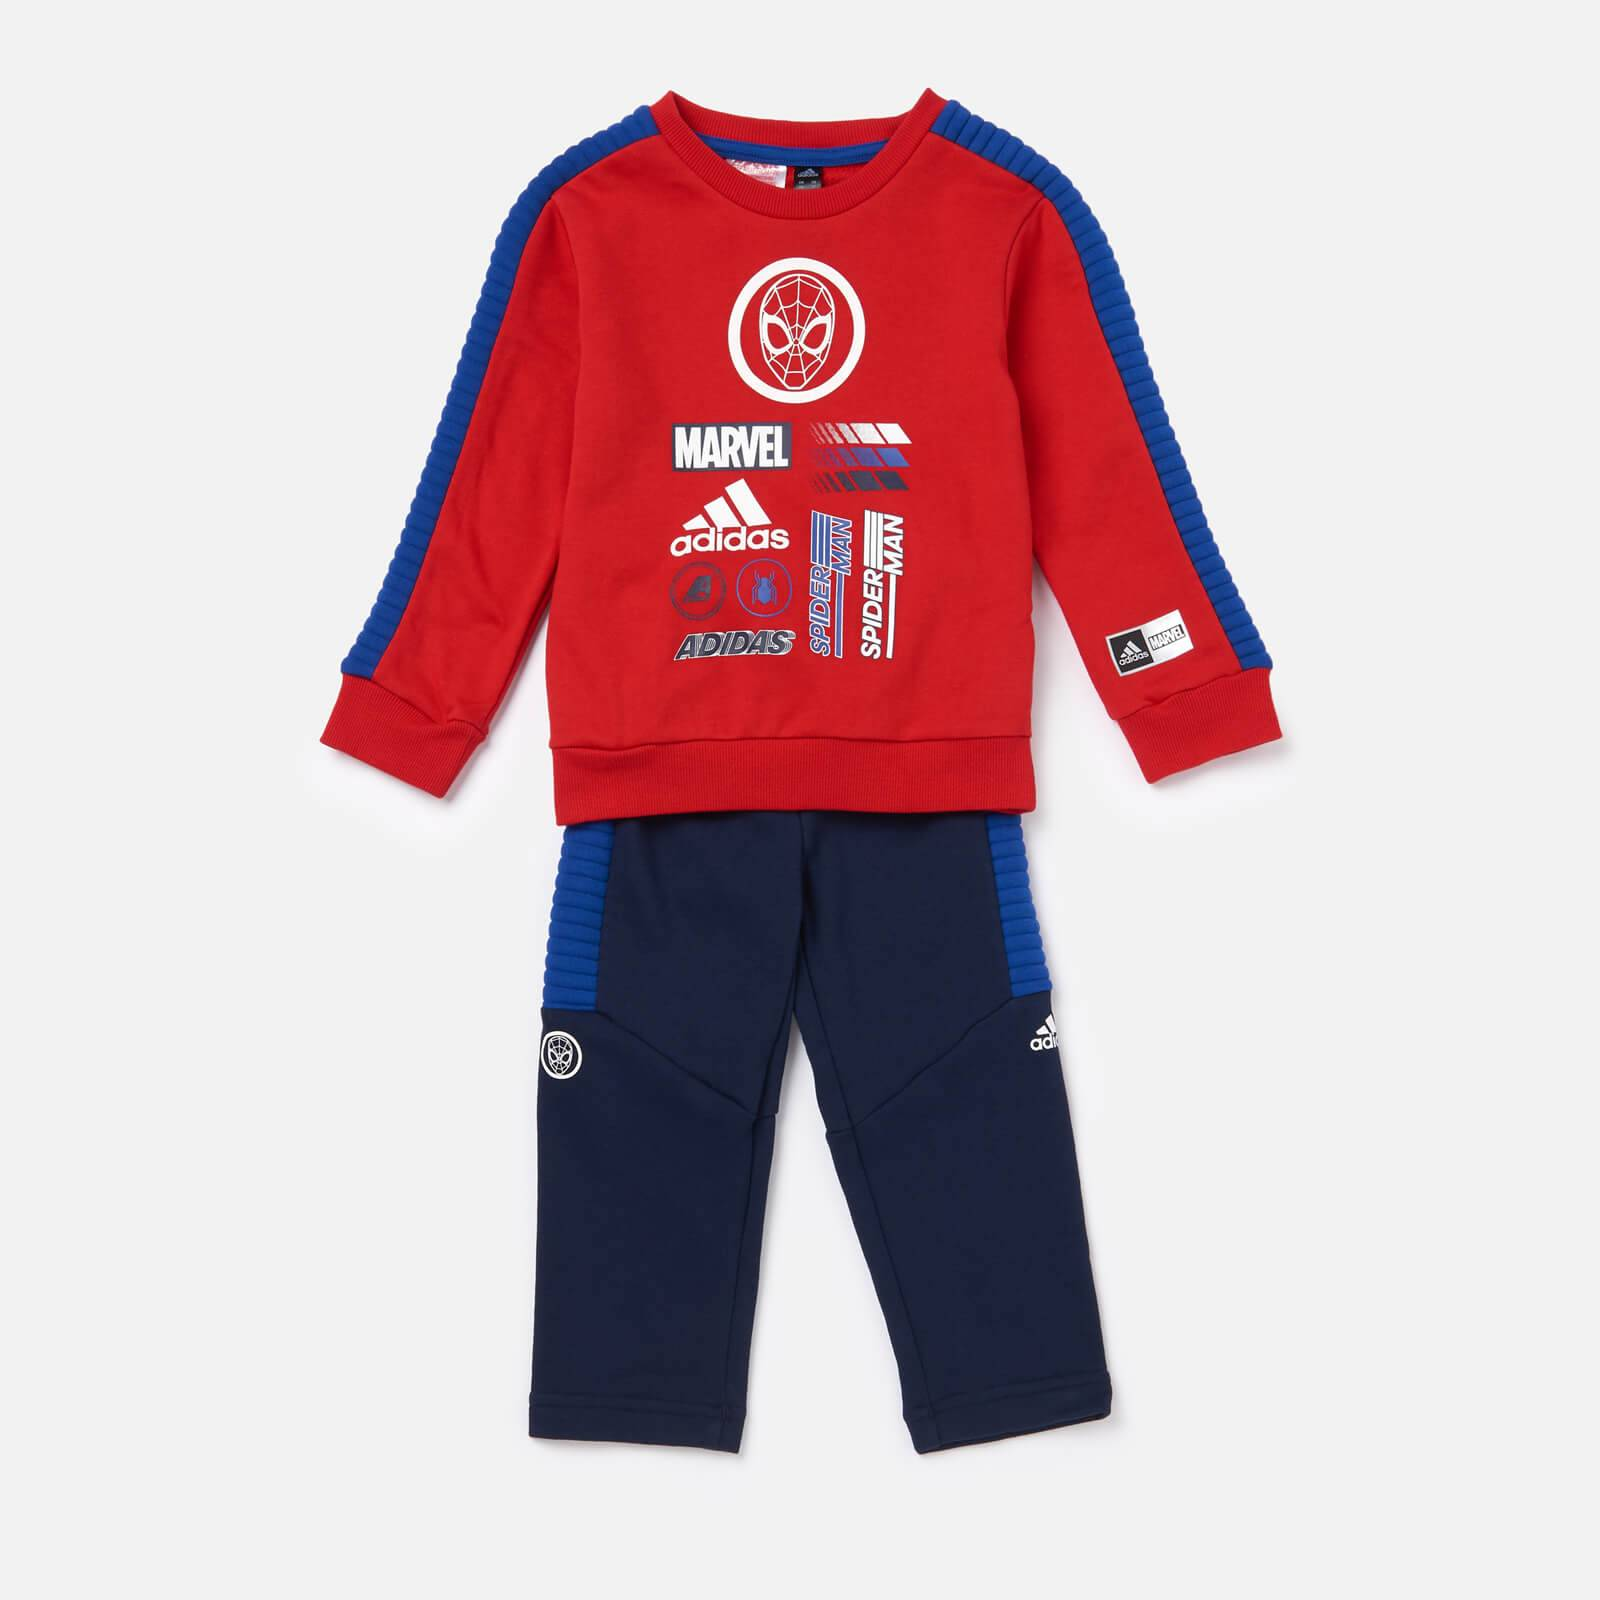 adidas Boys' Infant Spider-Man Jogger Set - Red/Blue - 9-12 months